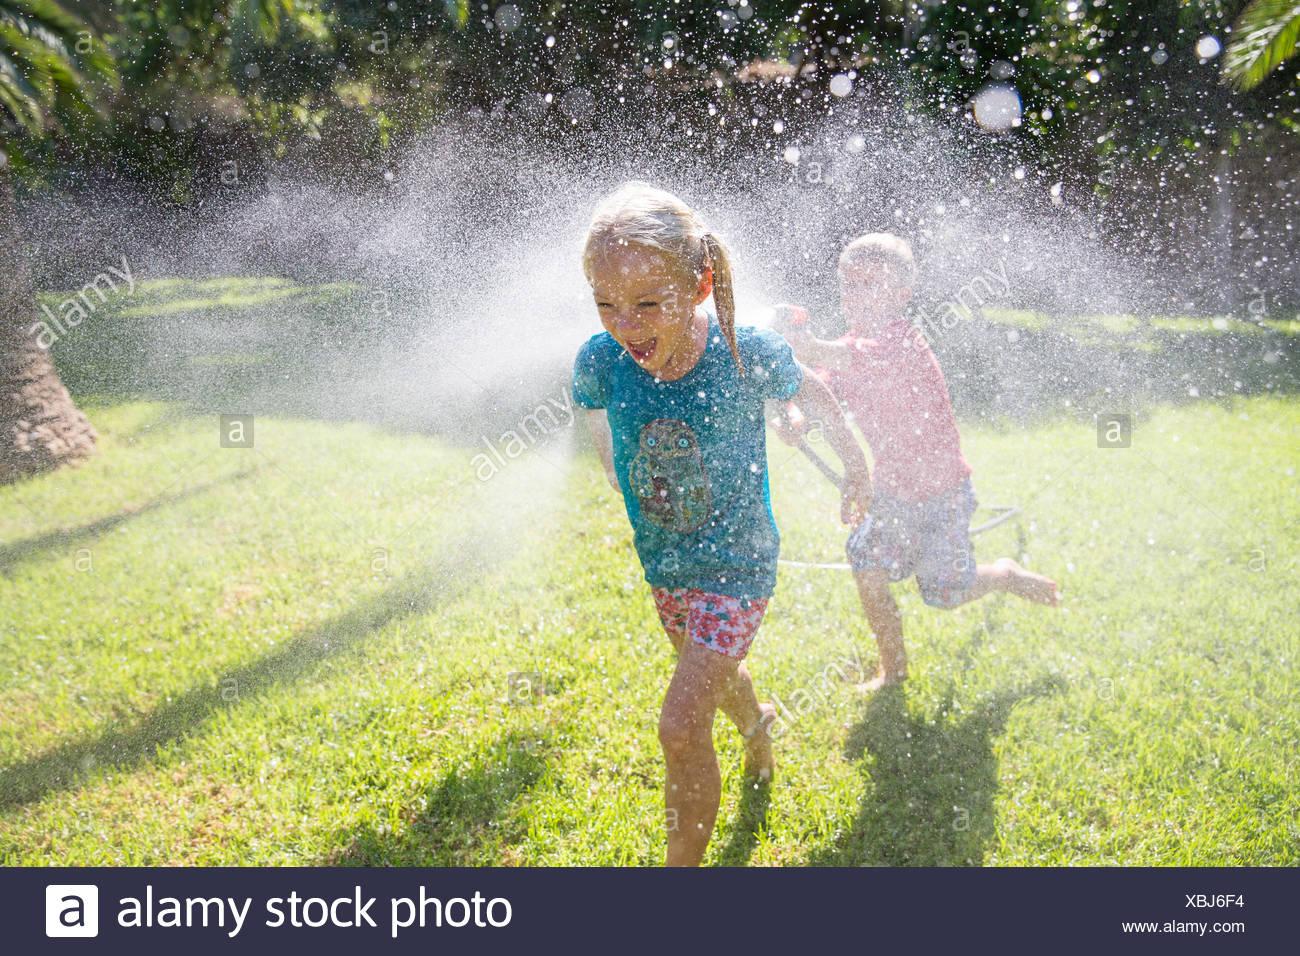 Boy running after girl in garden with water sprinkler - Stock Image